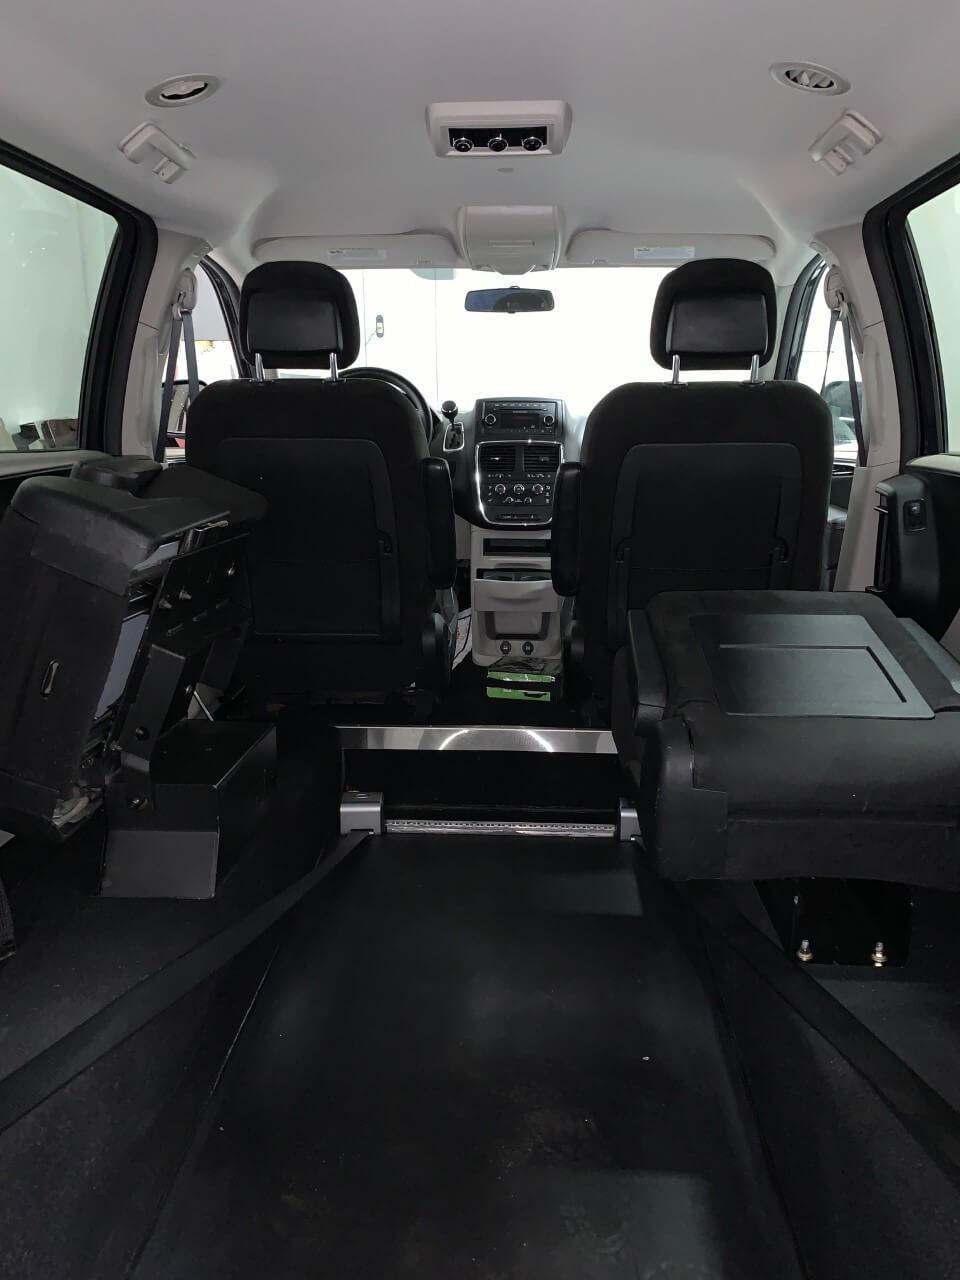 Interior wheelchair space view of 2013 Dodge Grand Caravan